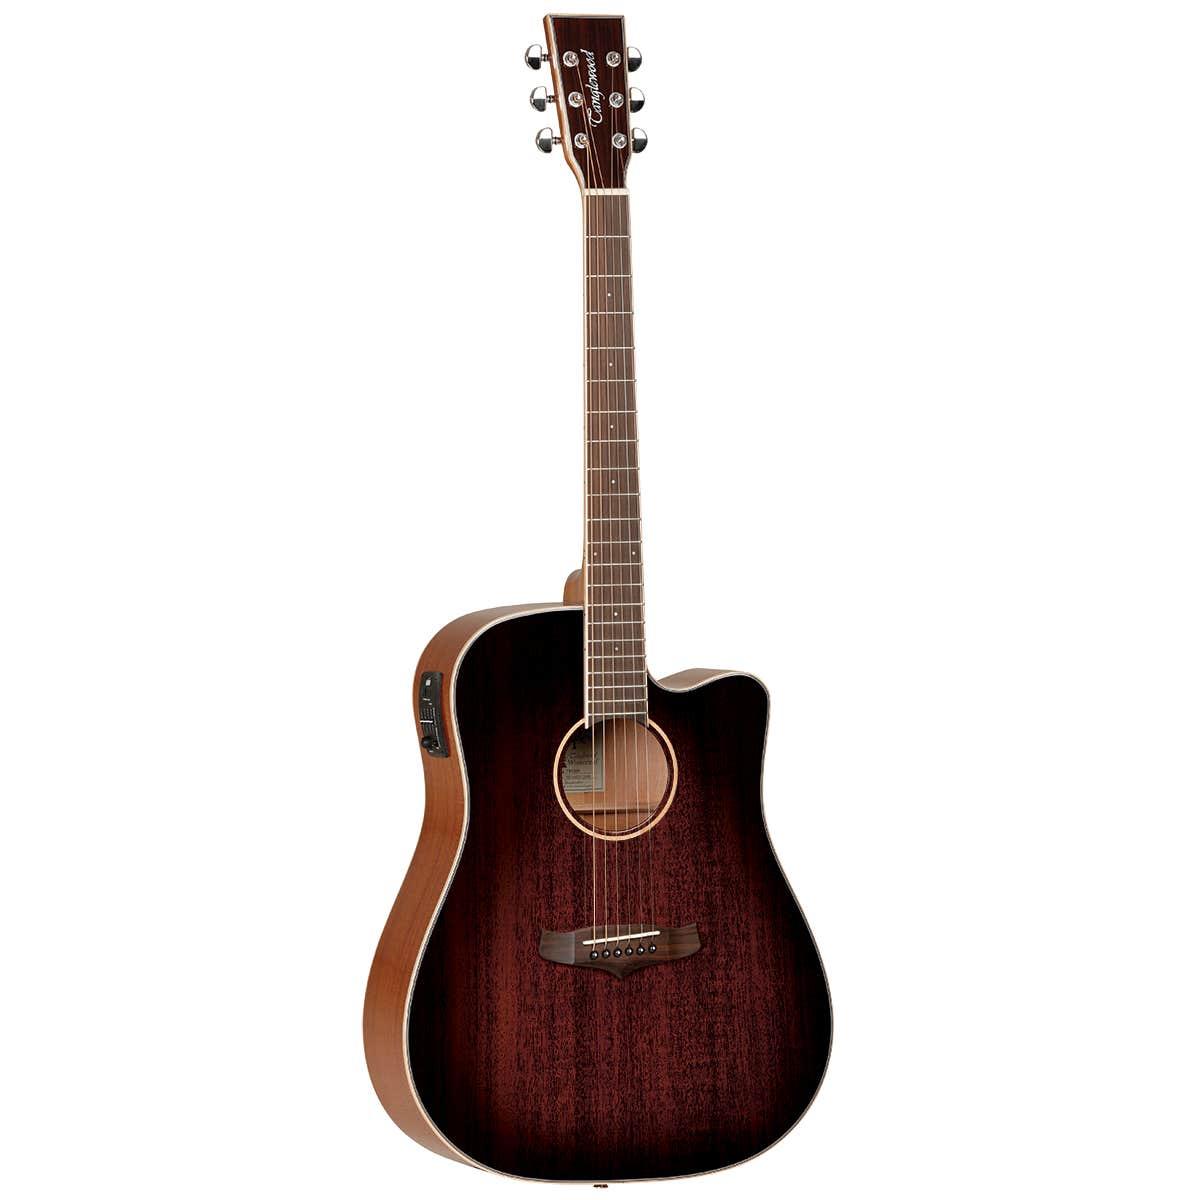 Tanglewood TW5AVB Winterleaf Acoustic Electric Guitar - Antique Vintage Burst